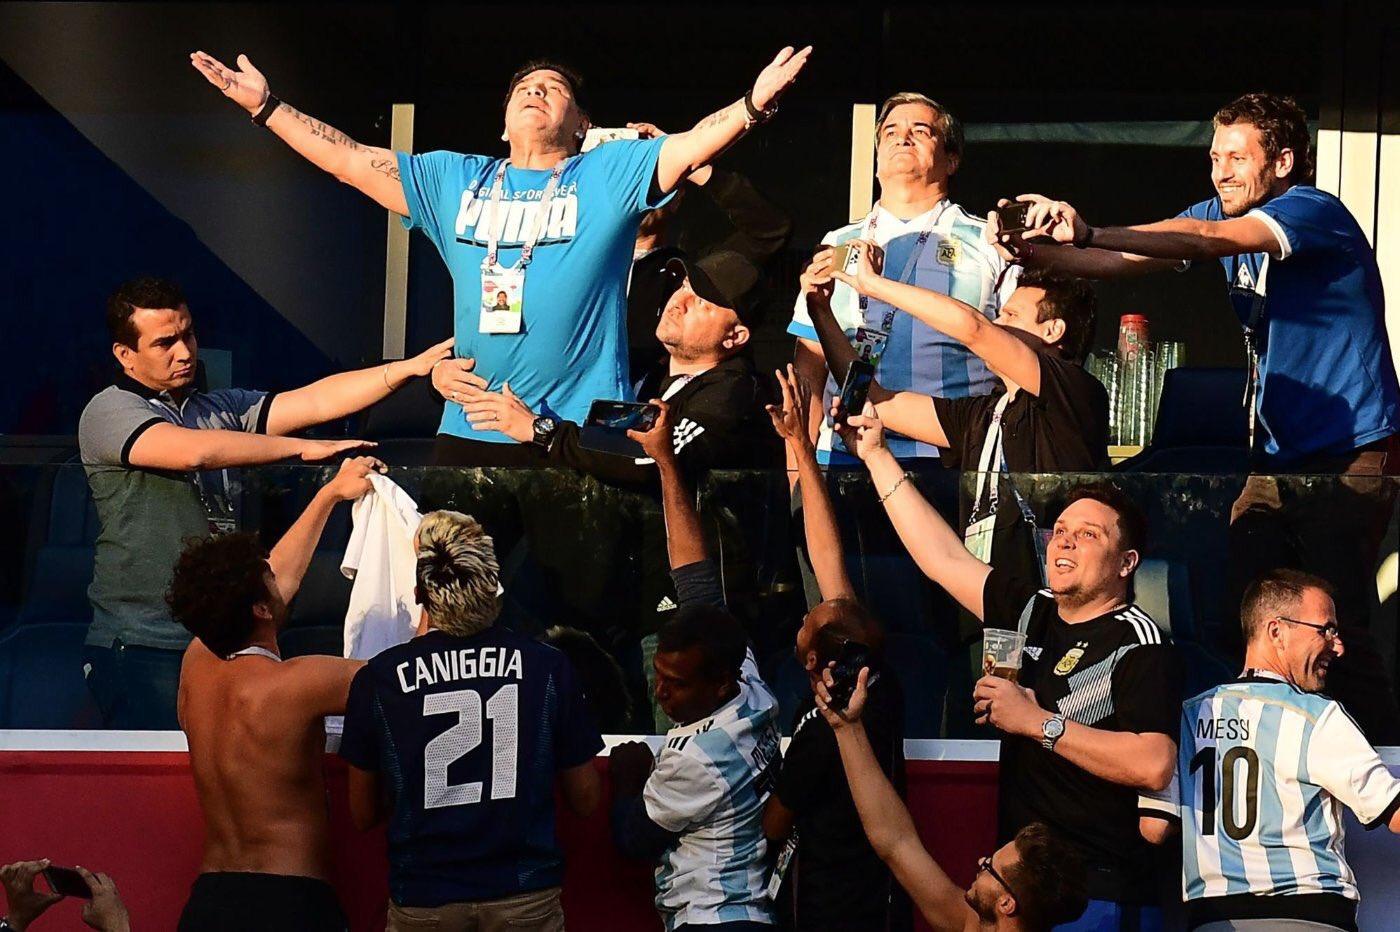 SON DAKİKA: Diego Maradona vefat etti!